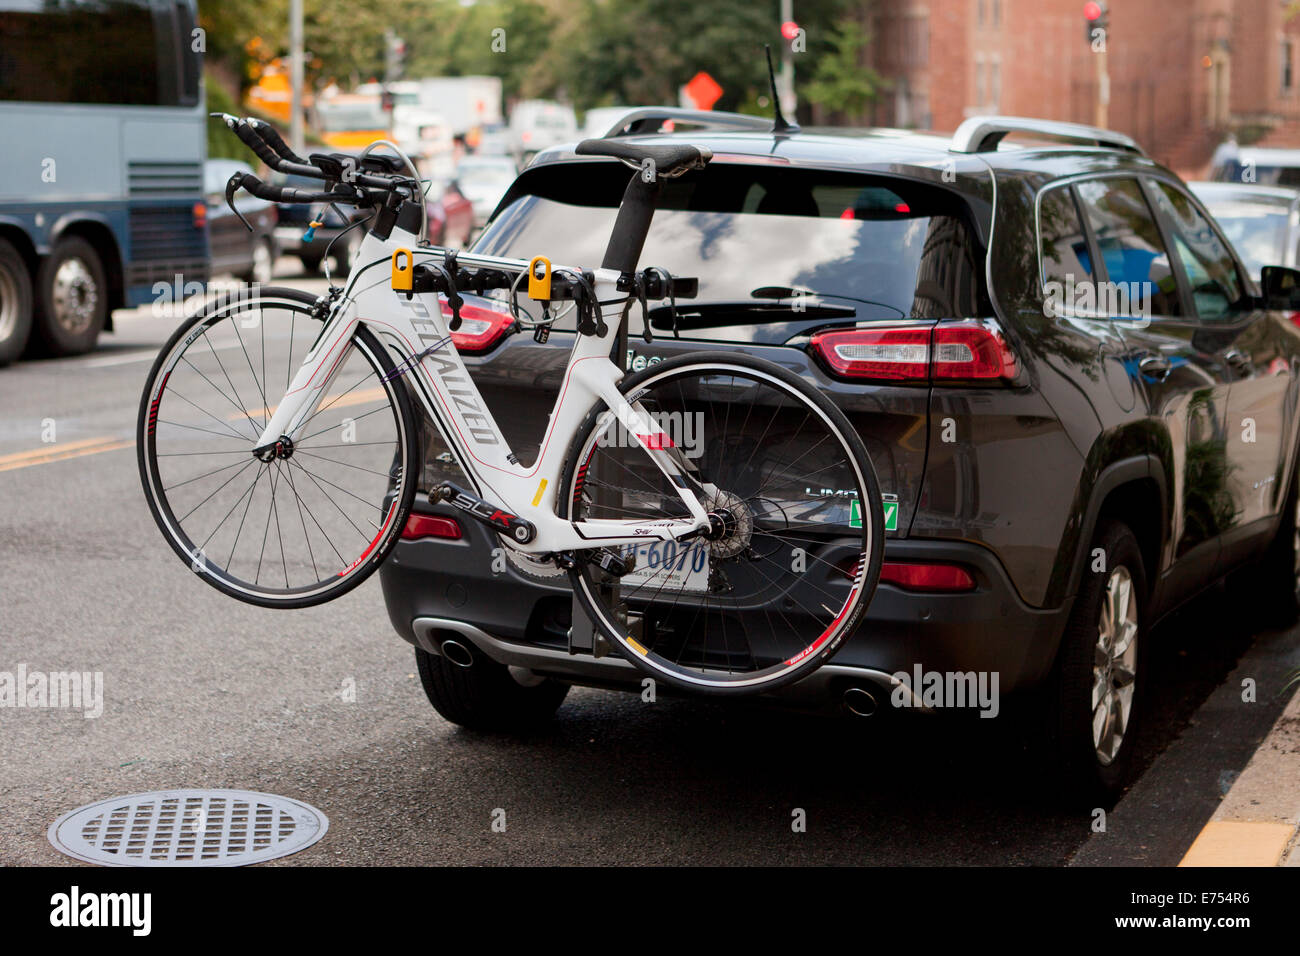 https www alamy com stock photo bicycle on rear mounted bike rack usa 73257610 html